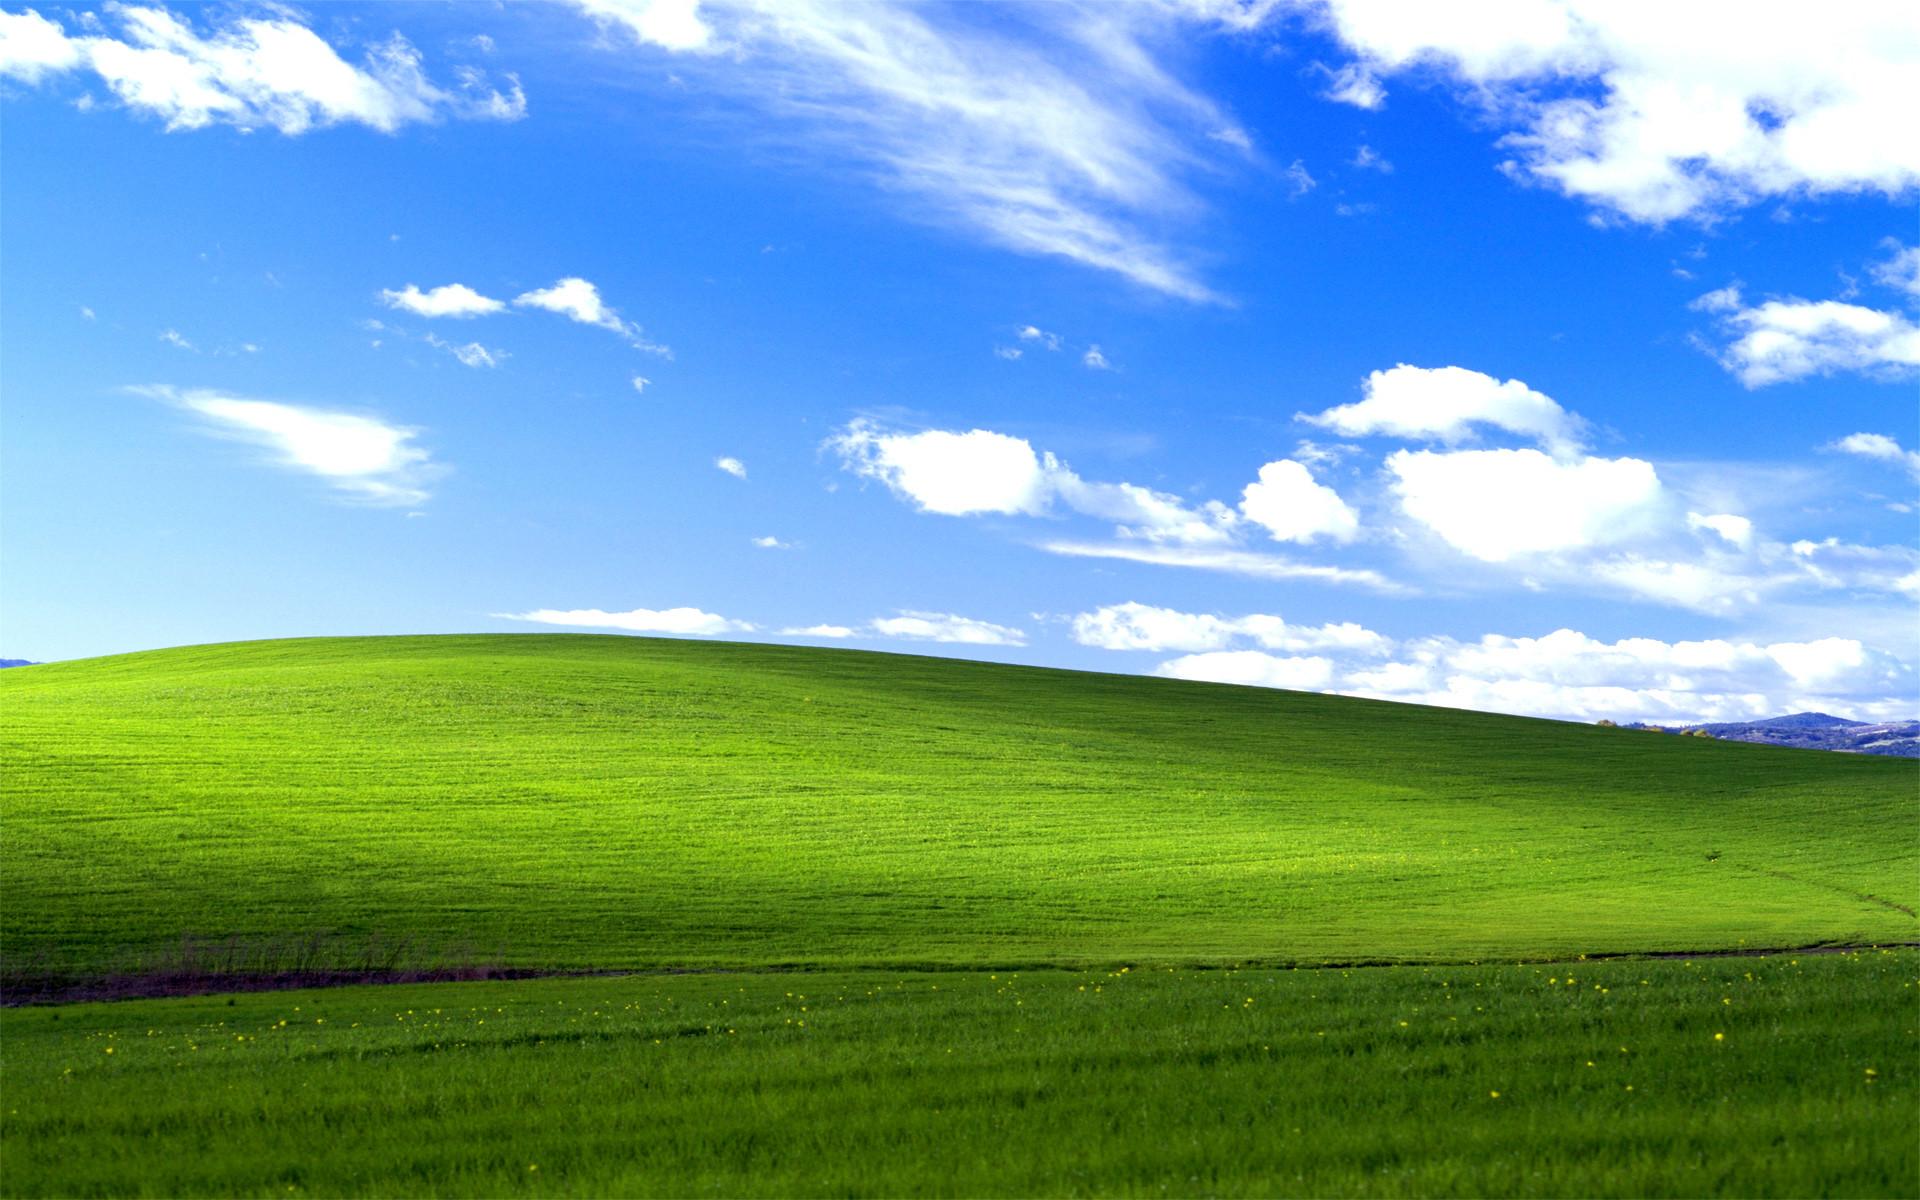 Res: 1920x1200, Tags: Windows Bliss. Description: Download Windows XP Bliss wallpaper ...